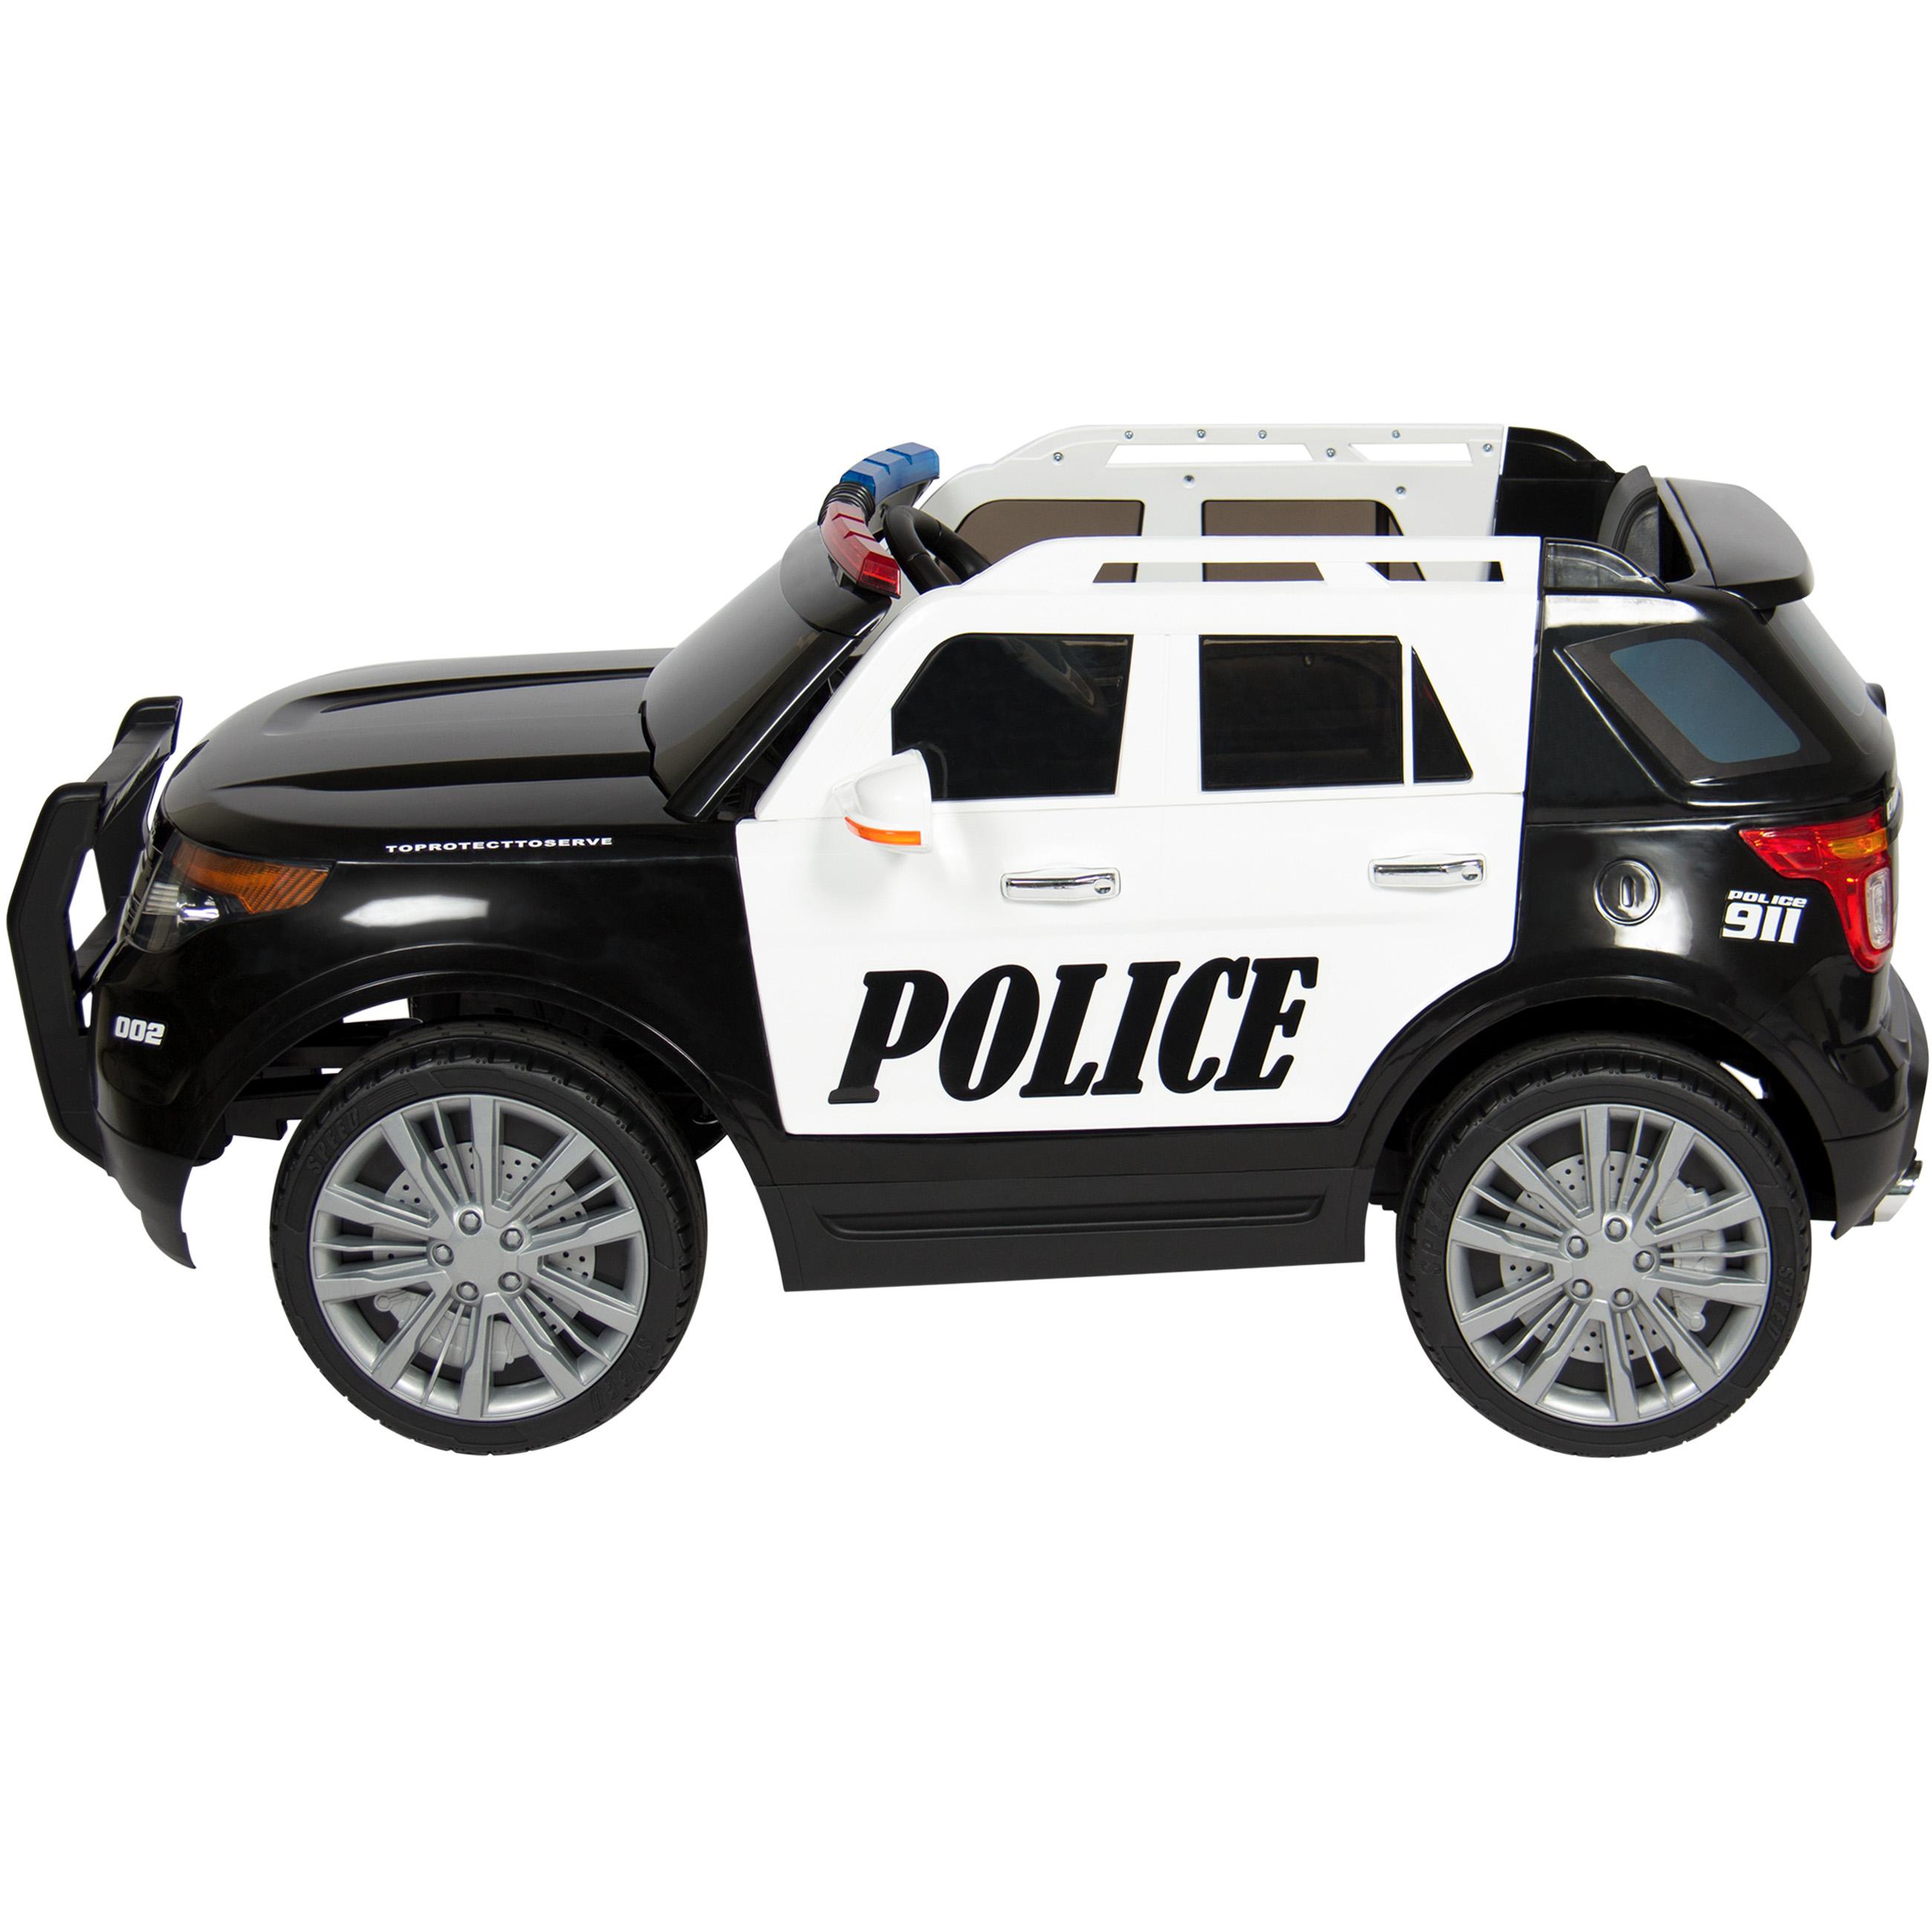 Bcp 12v Kids Police Ride On Suv Car W 2 Speeds Lights